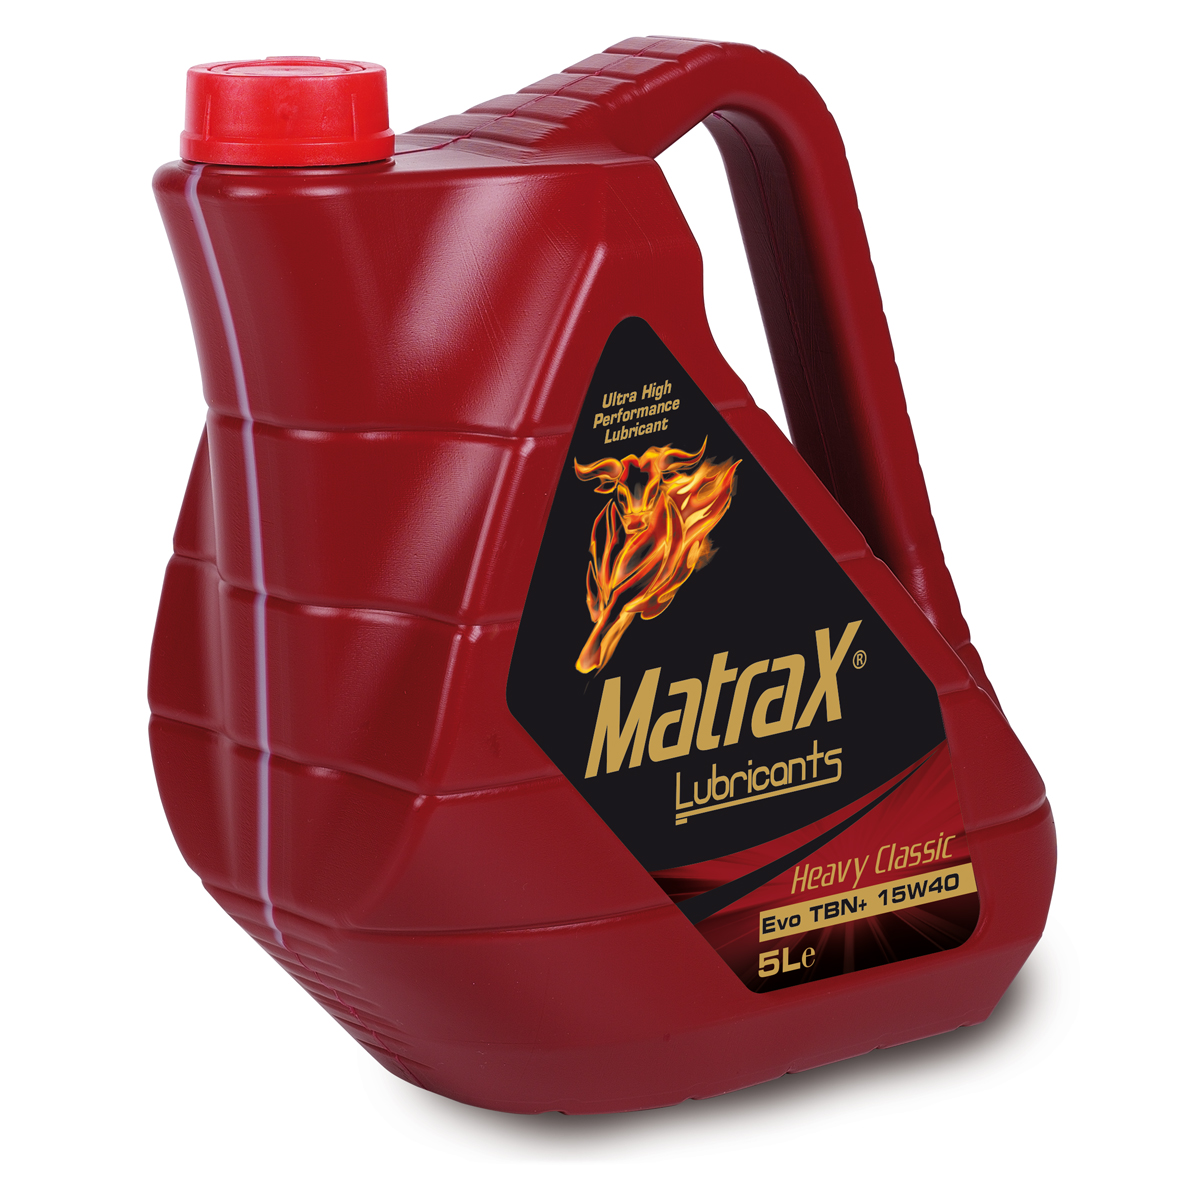 matrax-lubricants-heavy-classic-Evo-tbn-mas-15w40-5l